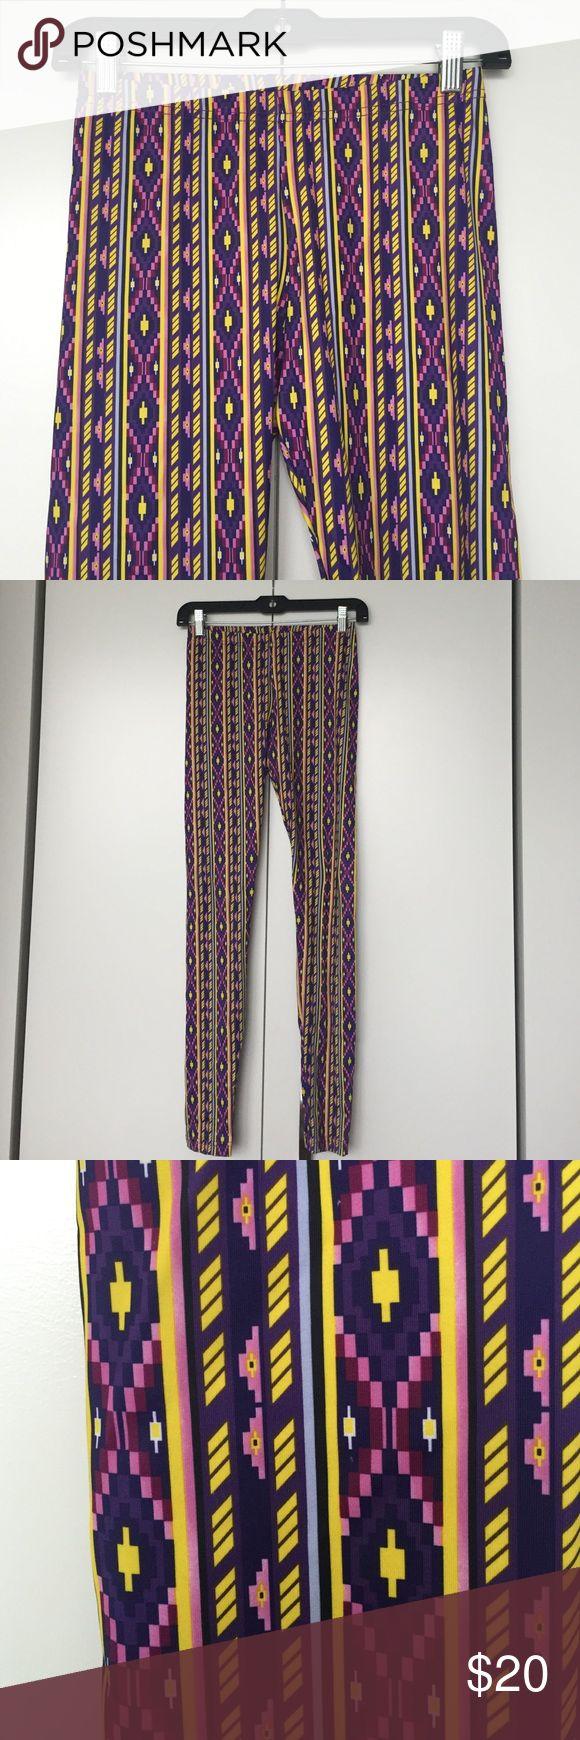 American Apparel Tribal Print Leggings Spandex nylon leggings in purple tribal print. Excellent used condition! American Apparel Pants Leggings